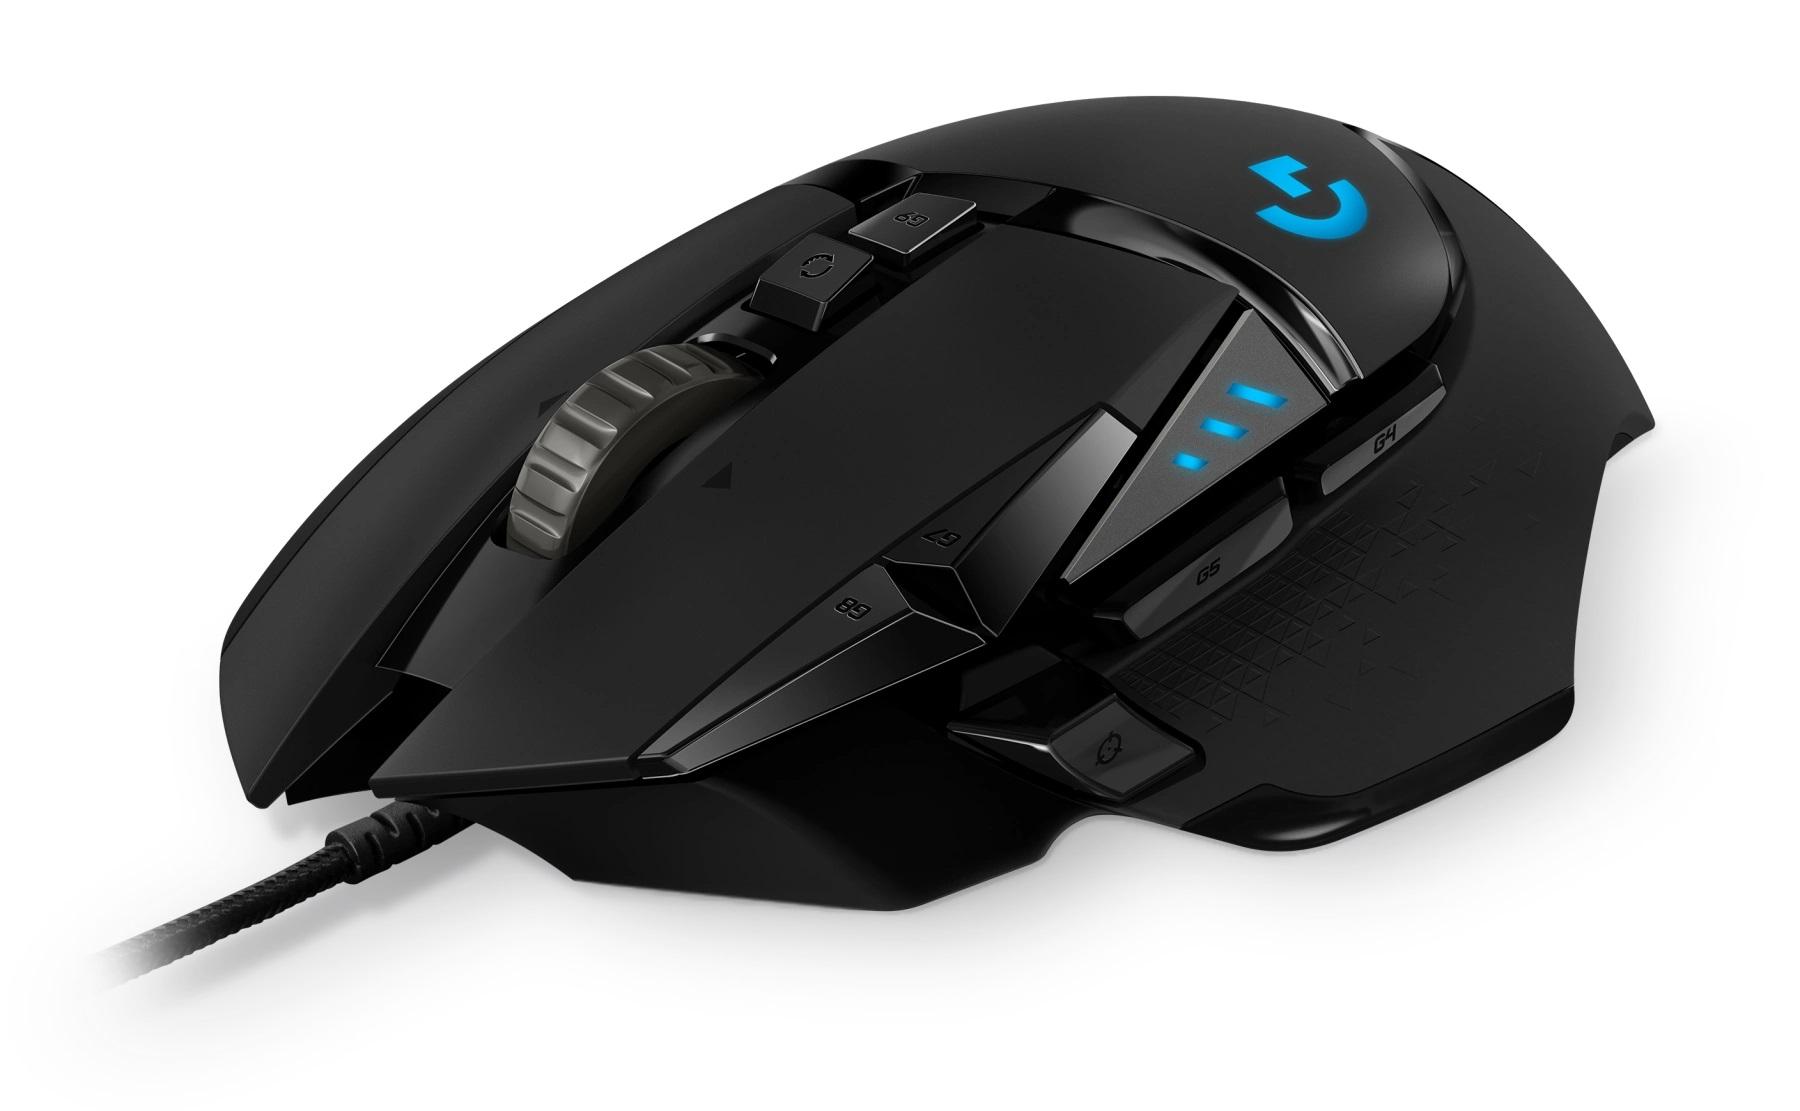 Logitech G502 Hero: miglior mouse gaming cablato